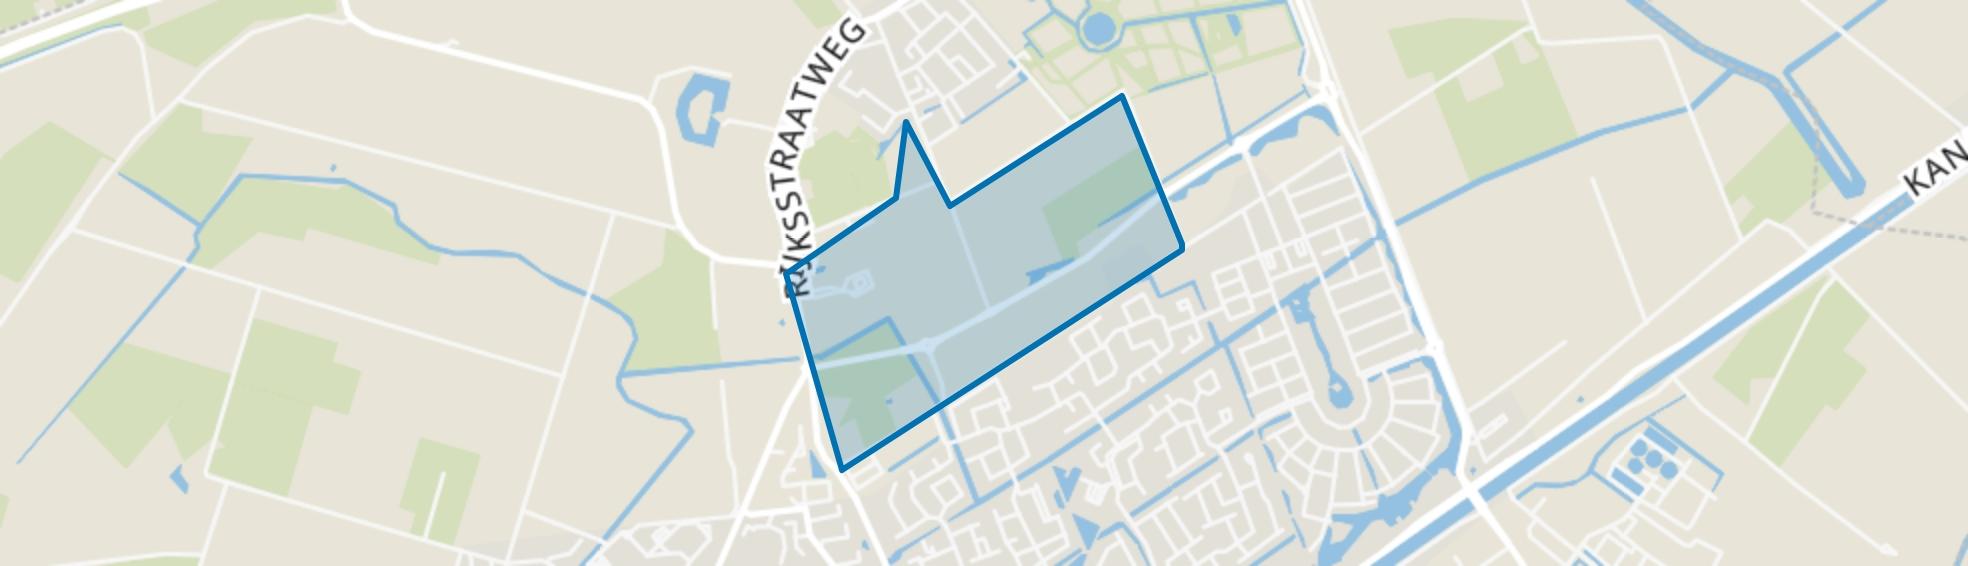 't Lange Land, Hellevoetsluis map